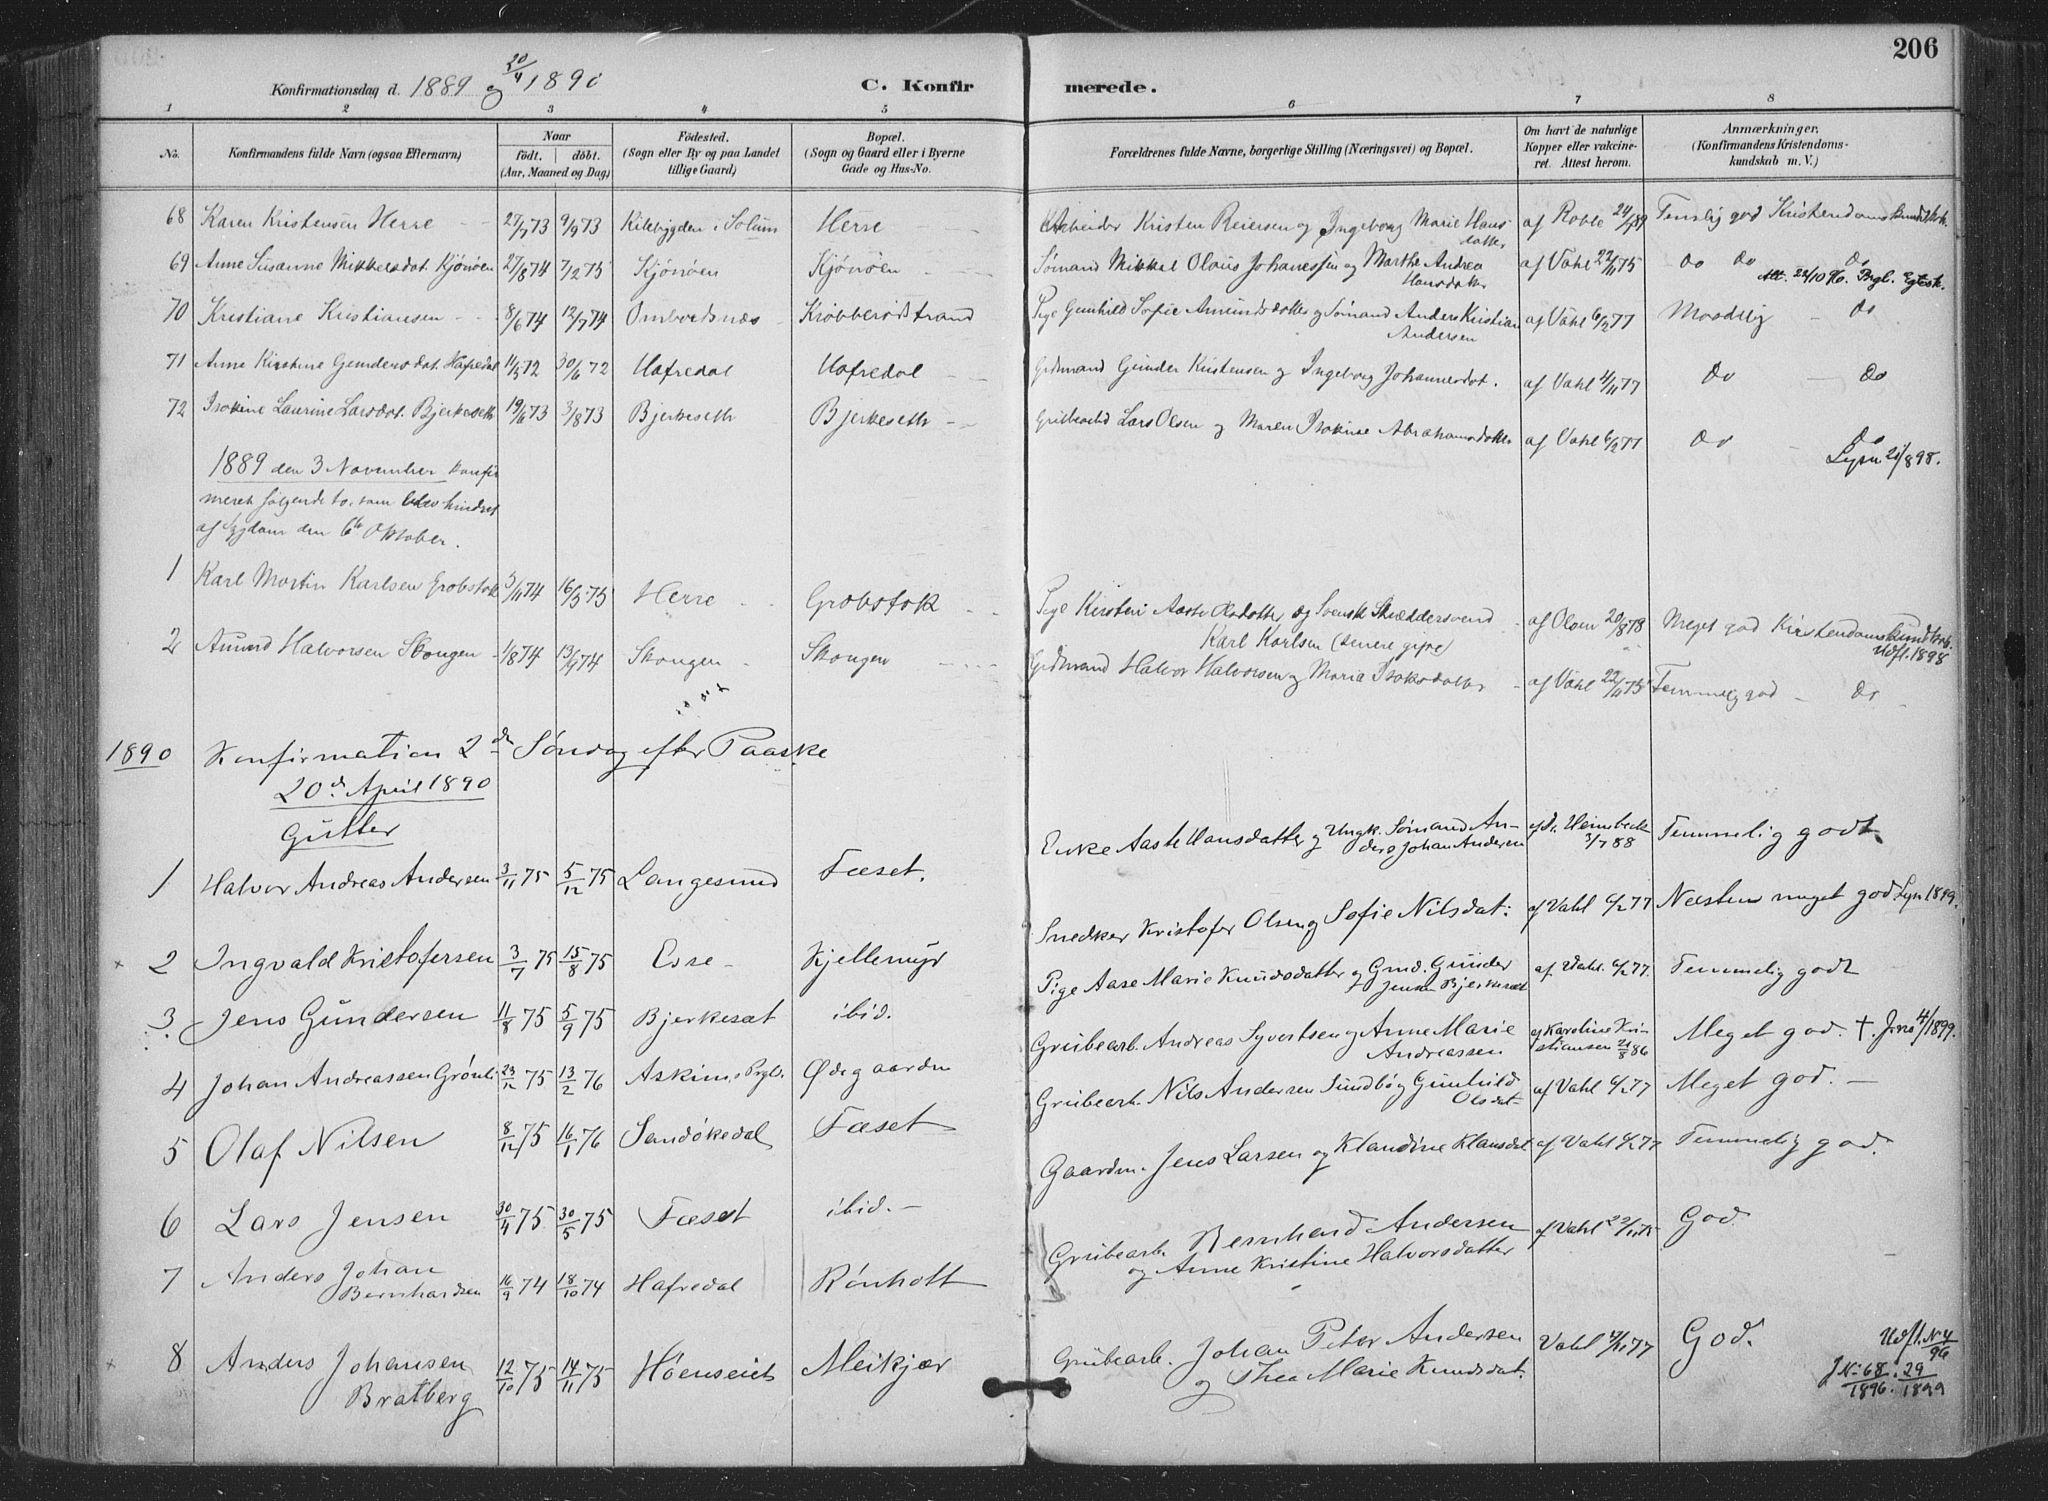 SAKO, Bamble kirkebøker, F/Fa/L0008: Ministerialbok nr. I 8, 1888-1900, s. 206